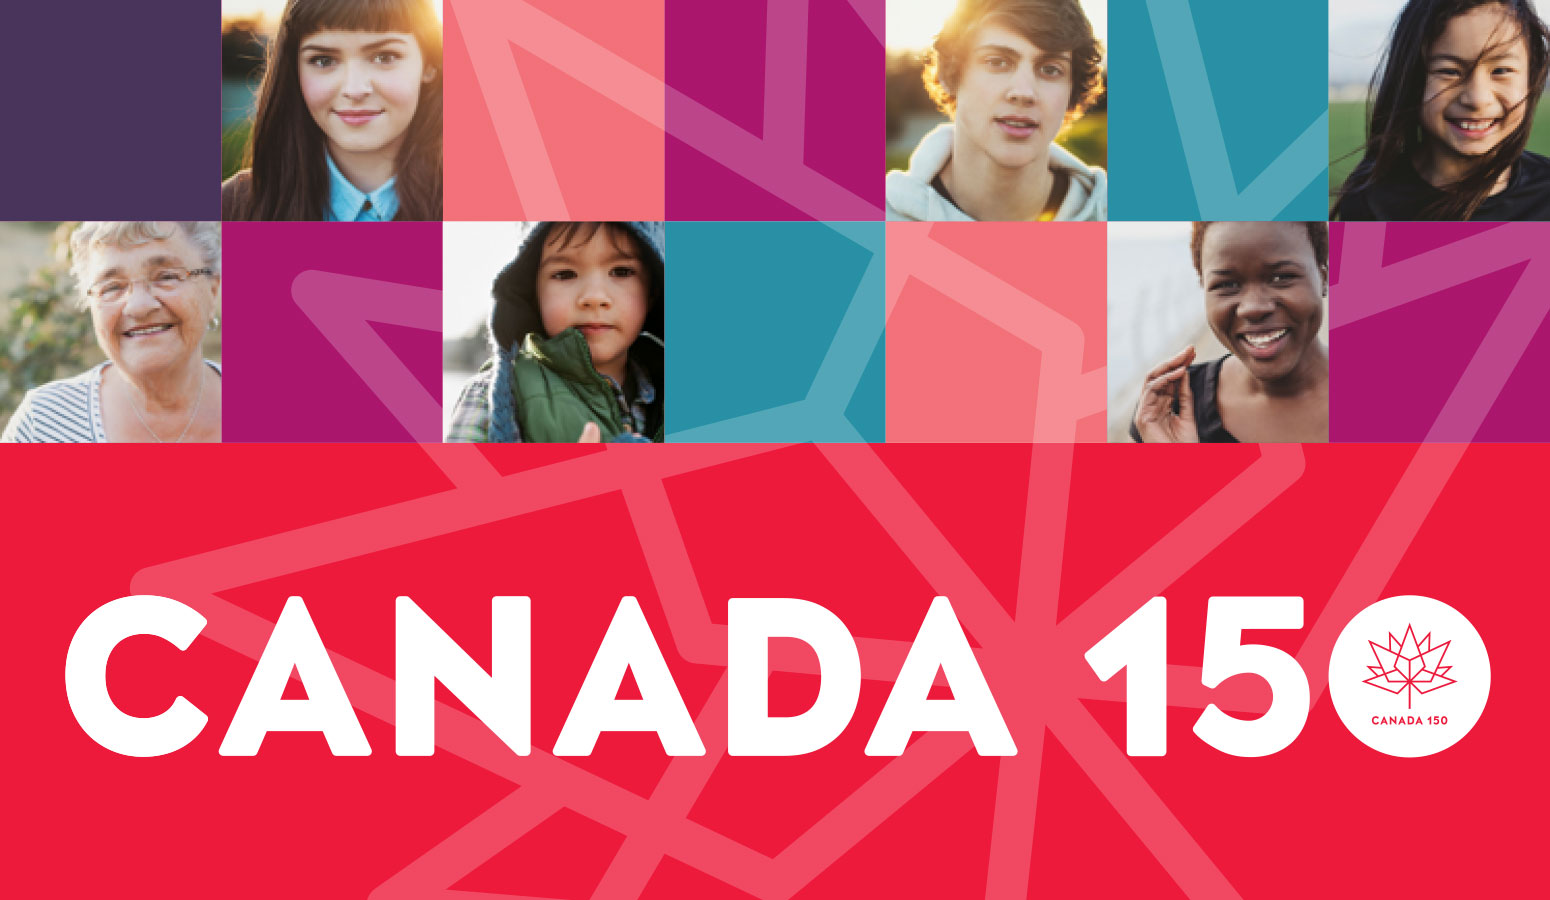 Canada 150 Photo Mosaic